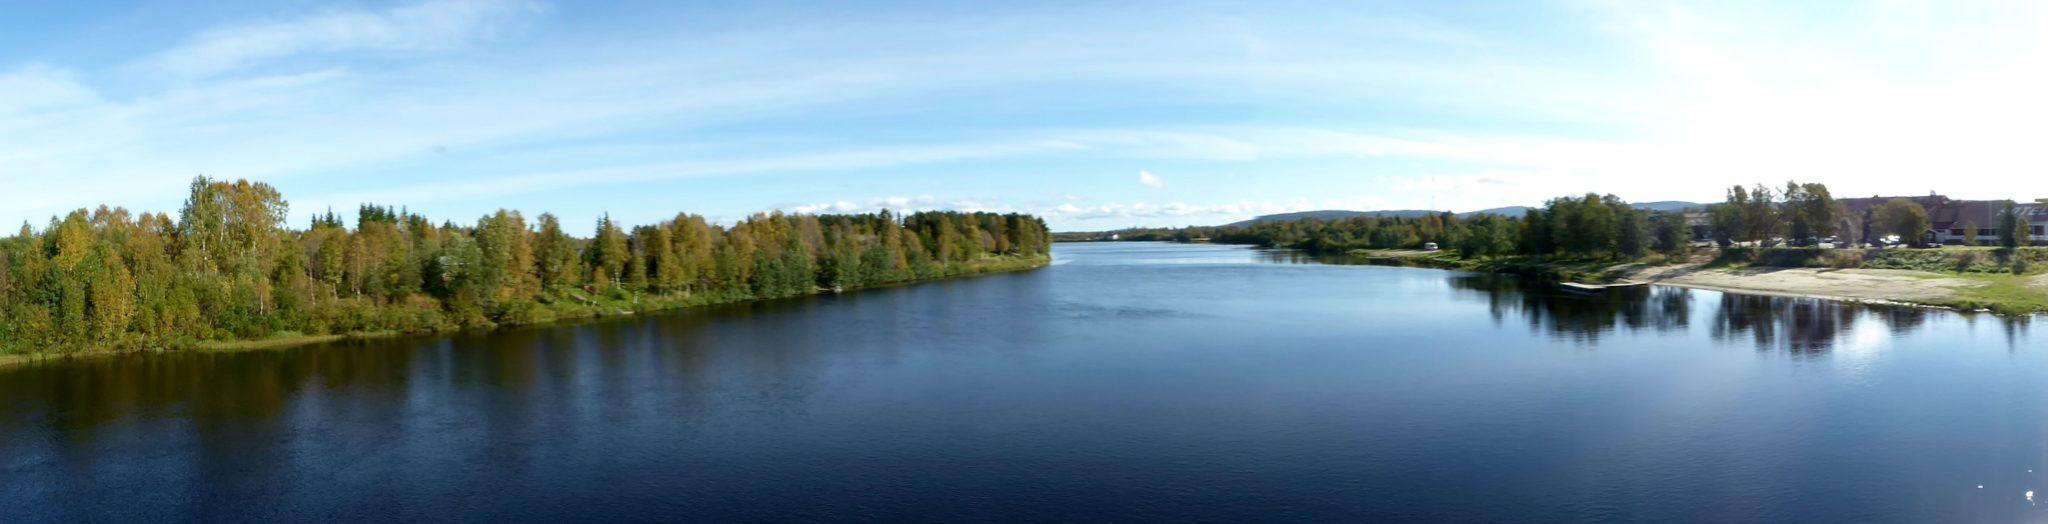 Ivalojoki